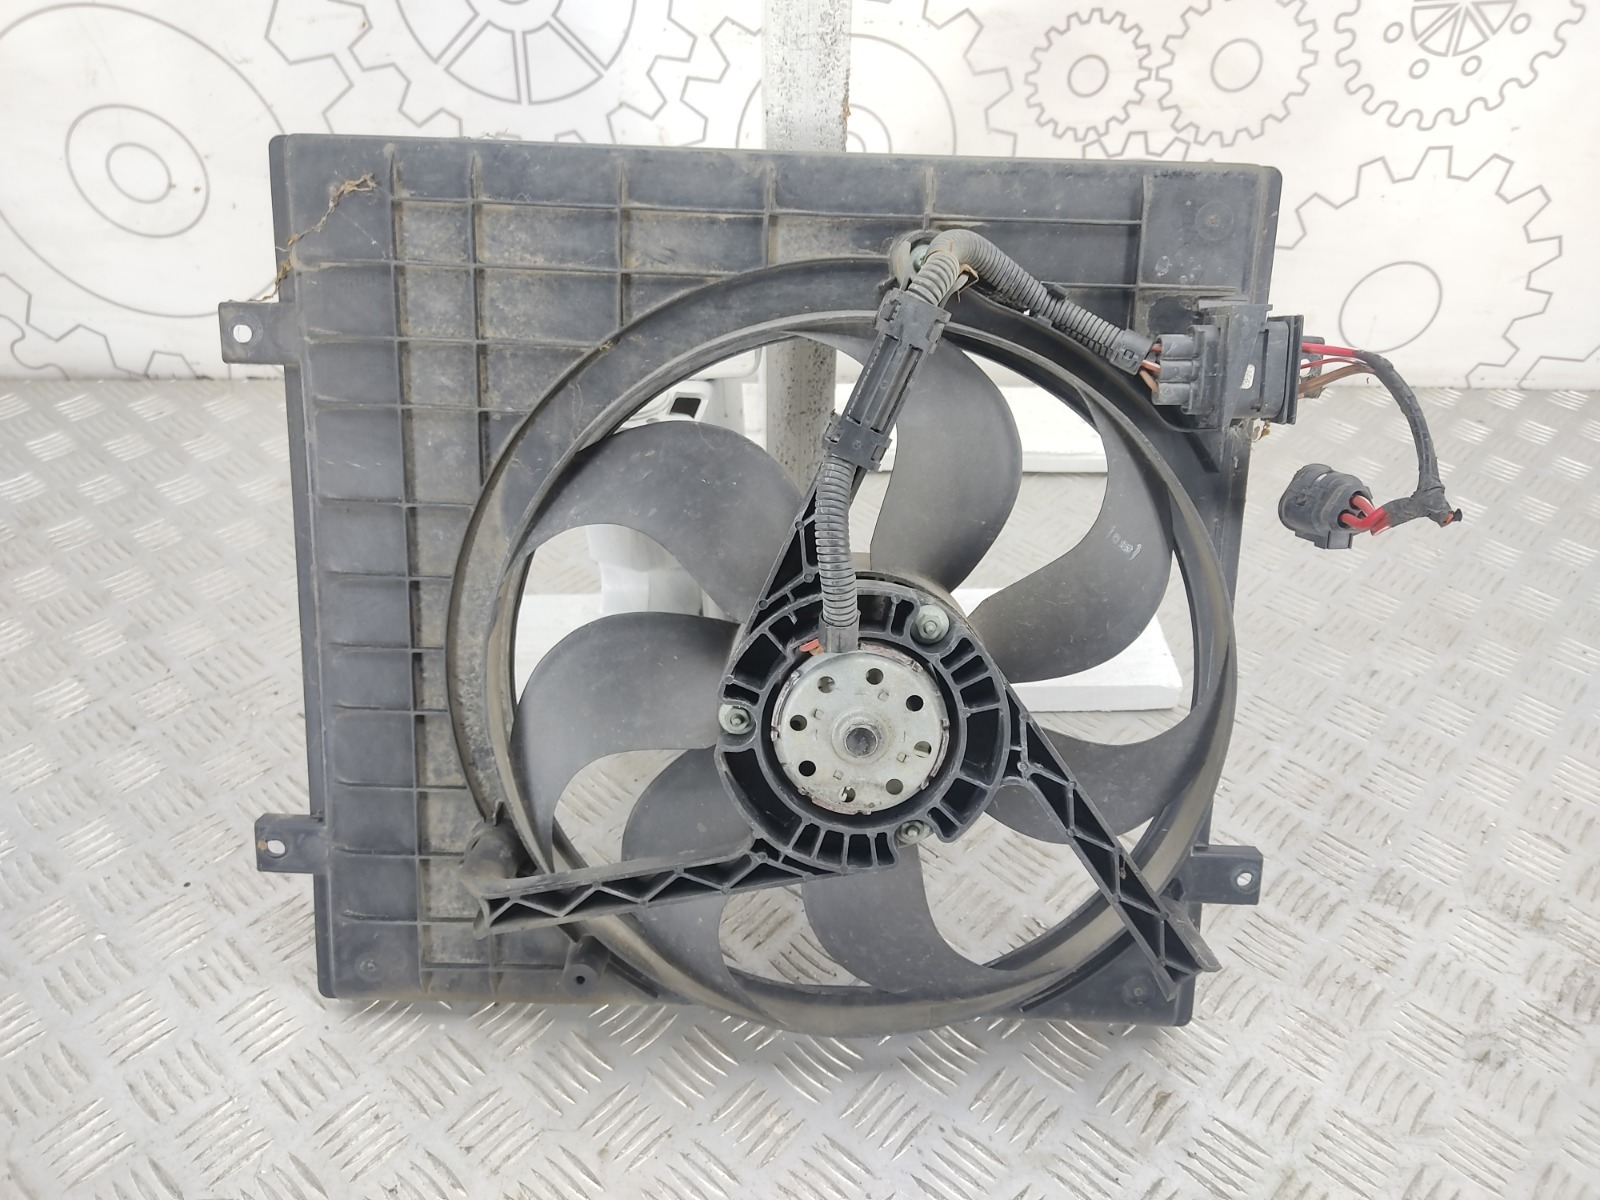 Вентилятор радиатора Skoda Fabia 1.2 I 2003 (б/у)